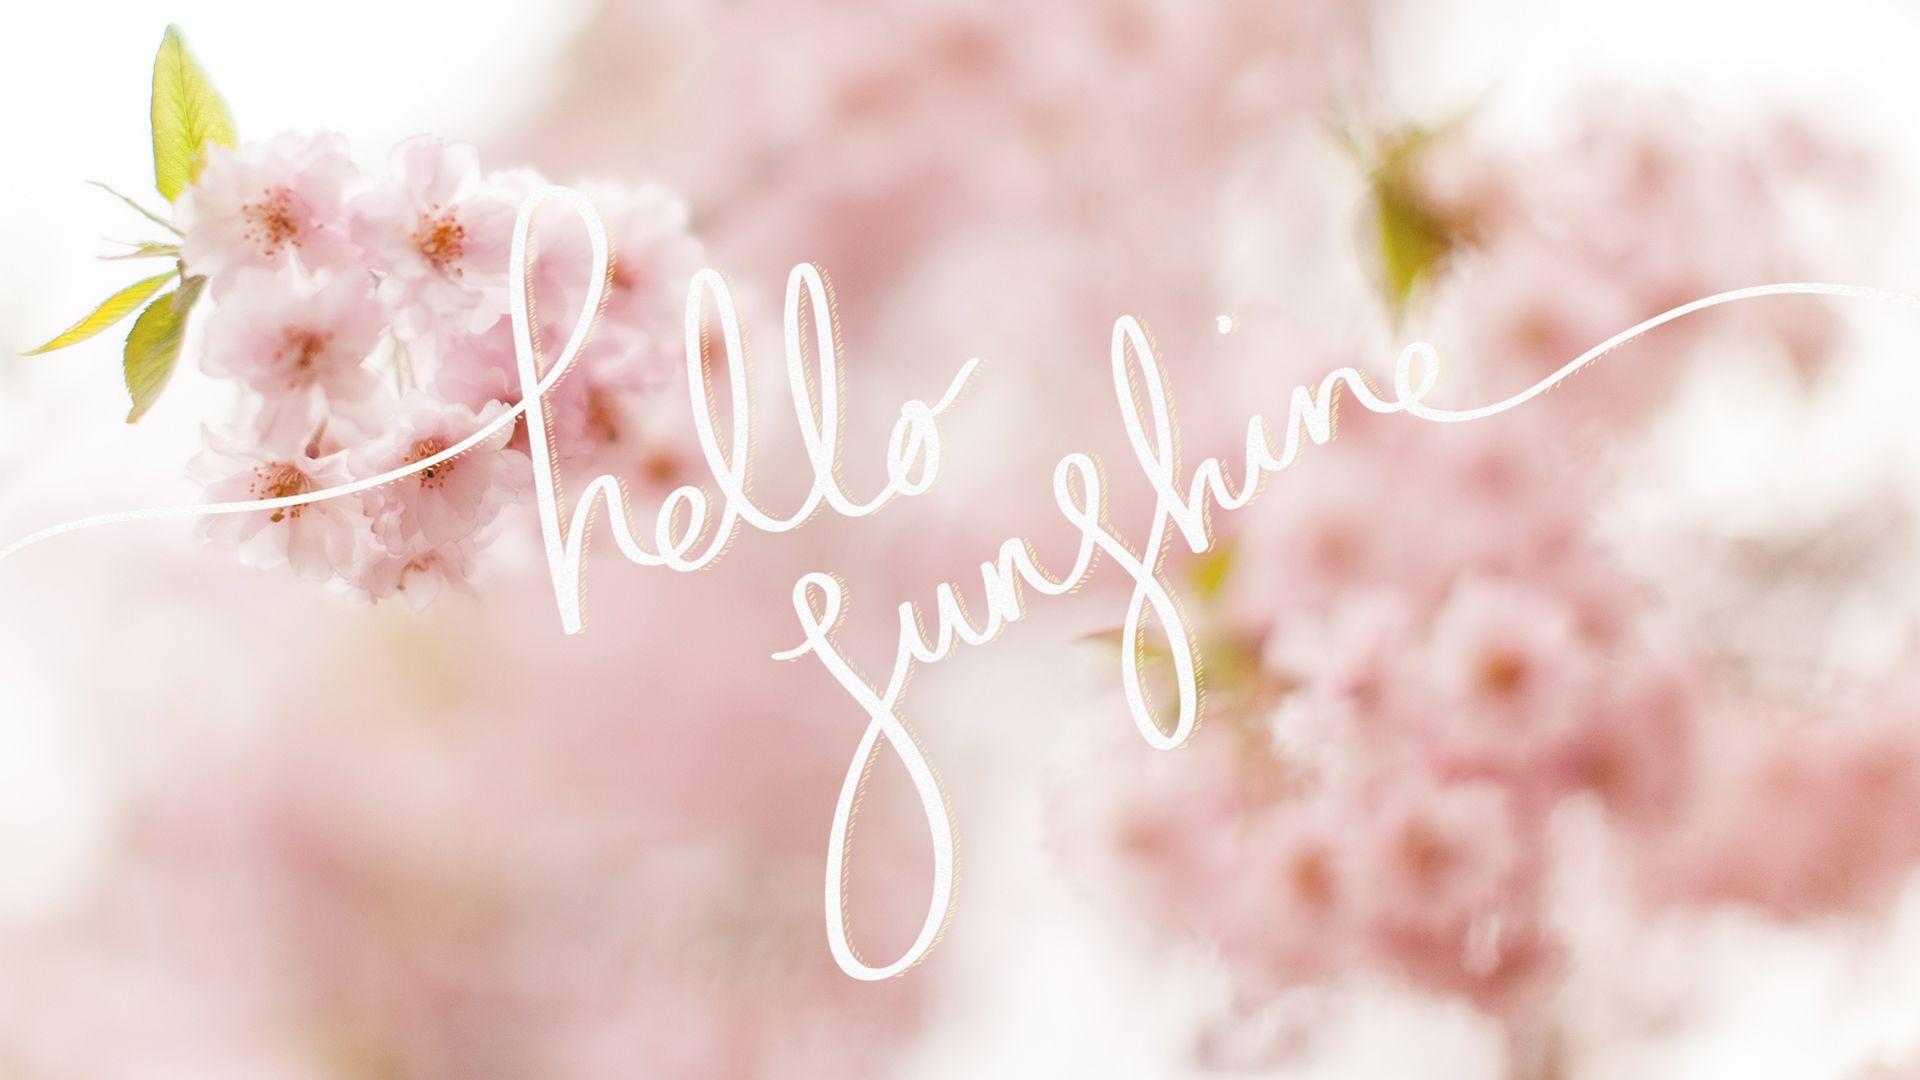 Hello Sunshine Wallpaper Spring Desktop Wallpaper Computer Wallpaper Desktop Wallpapers Spring Wallpaper